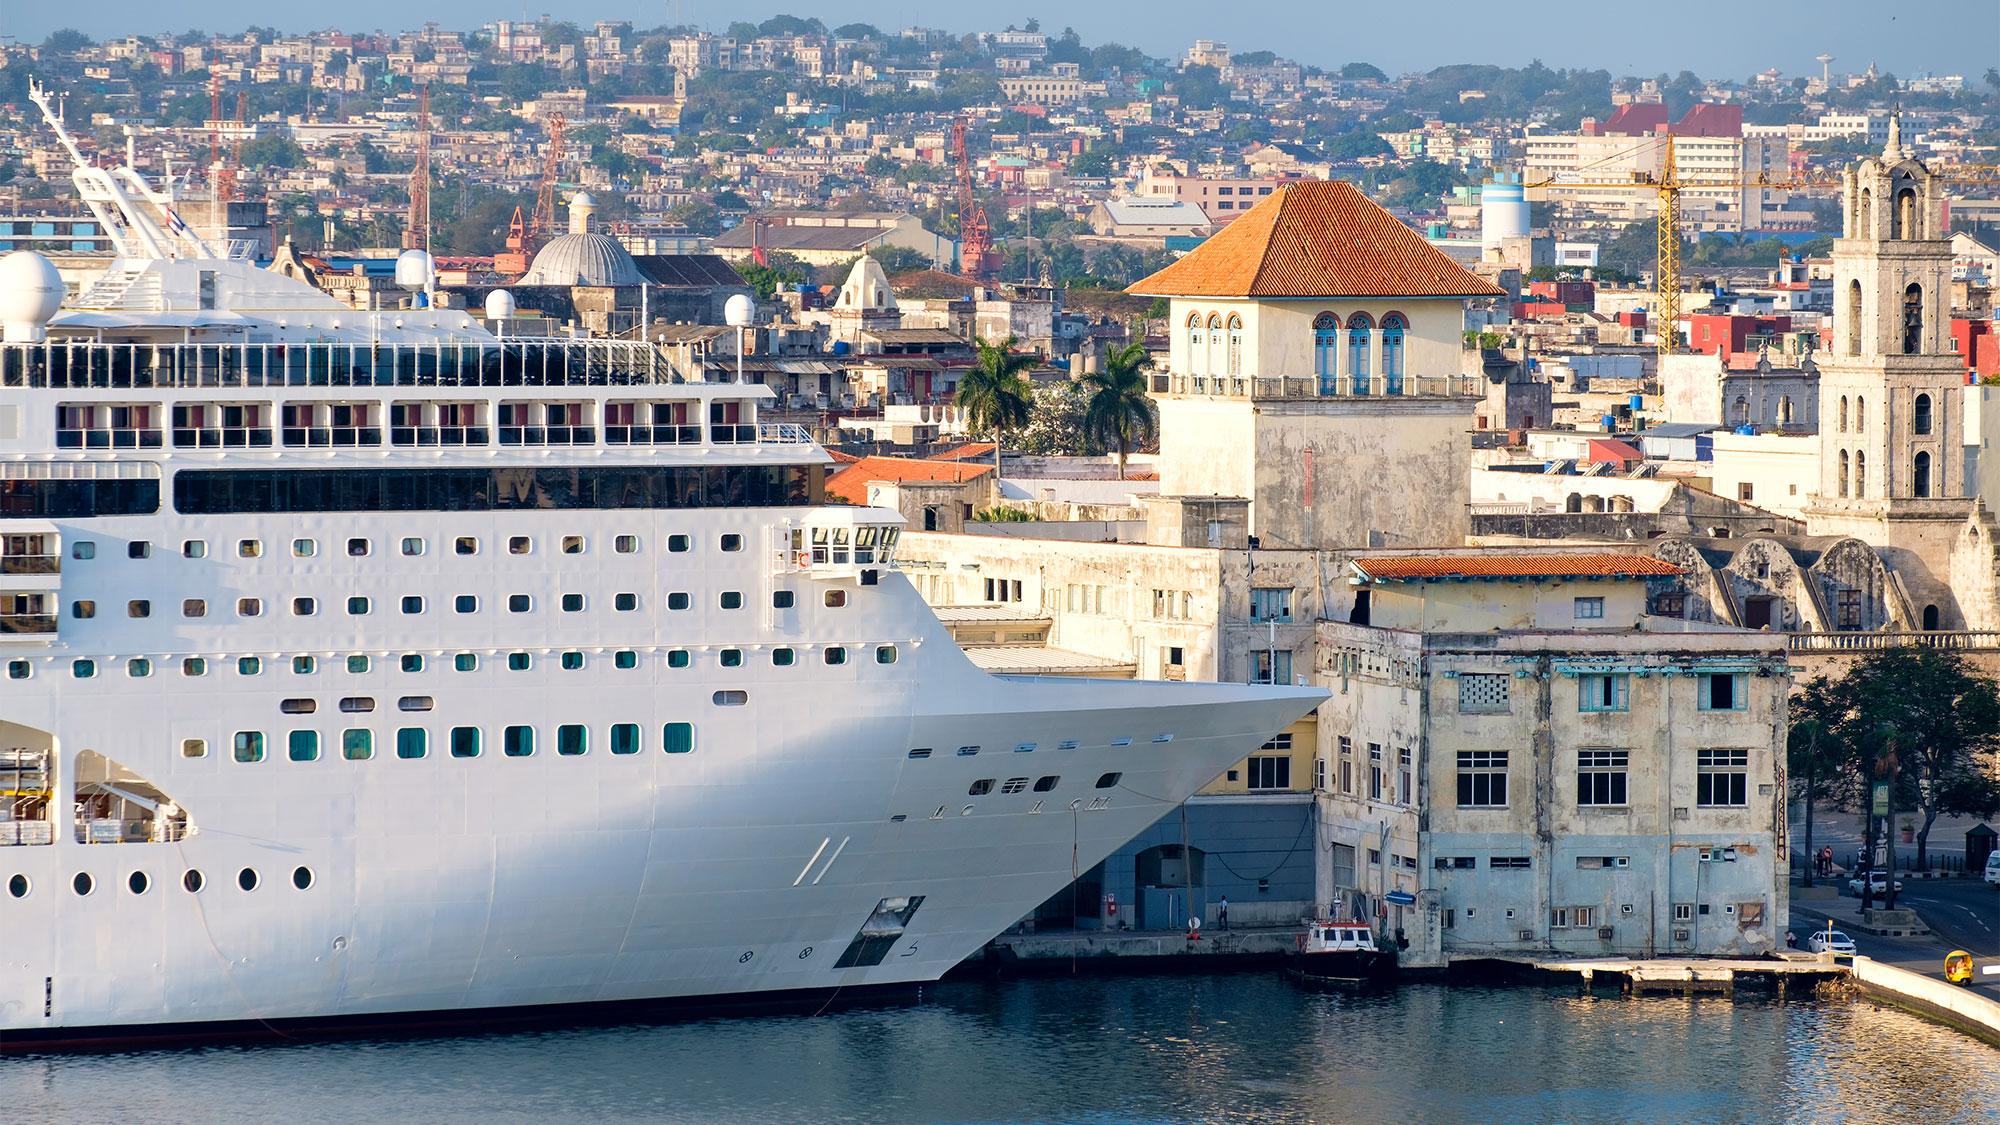 Cuba cruising intact but growth will be a struggle